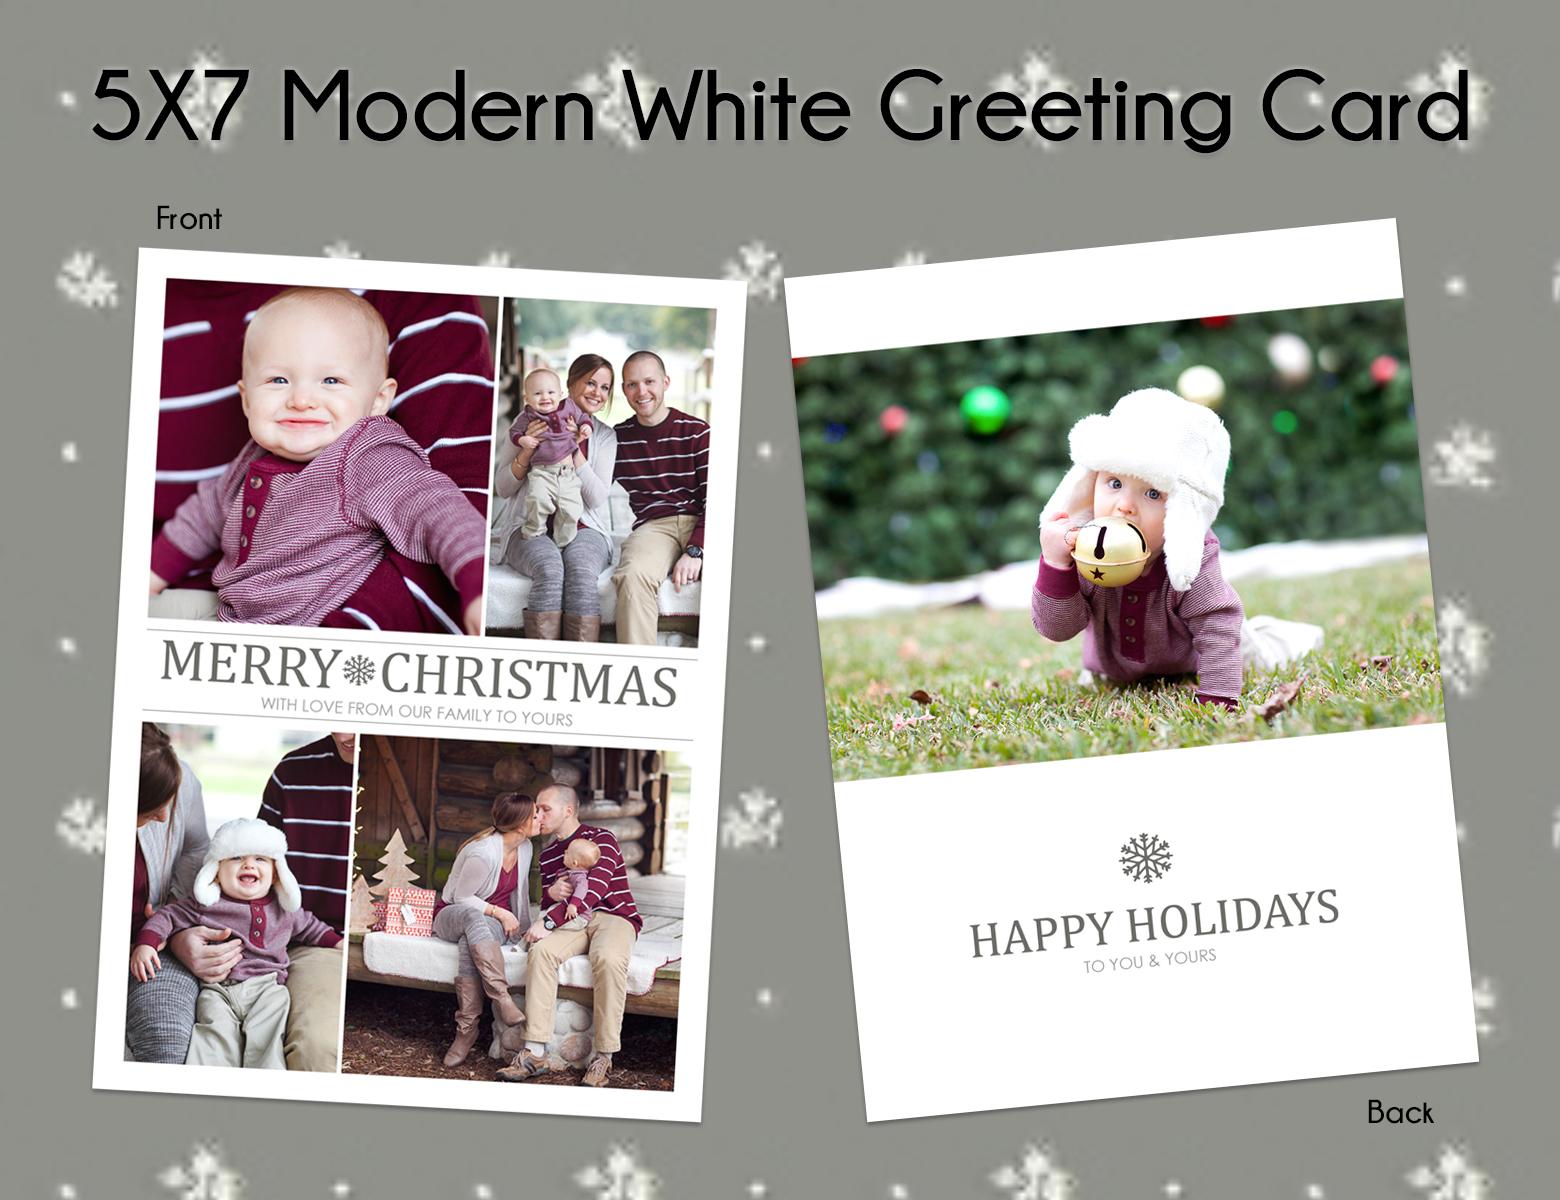 Option #3: 5x7 Modern White Greeting Card